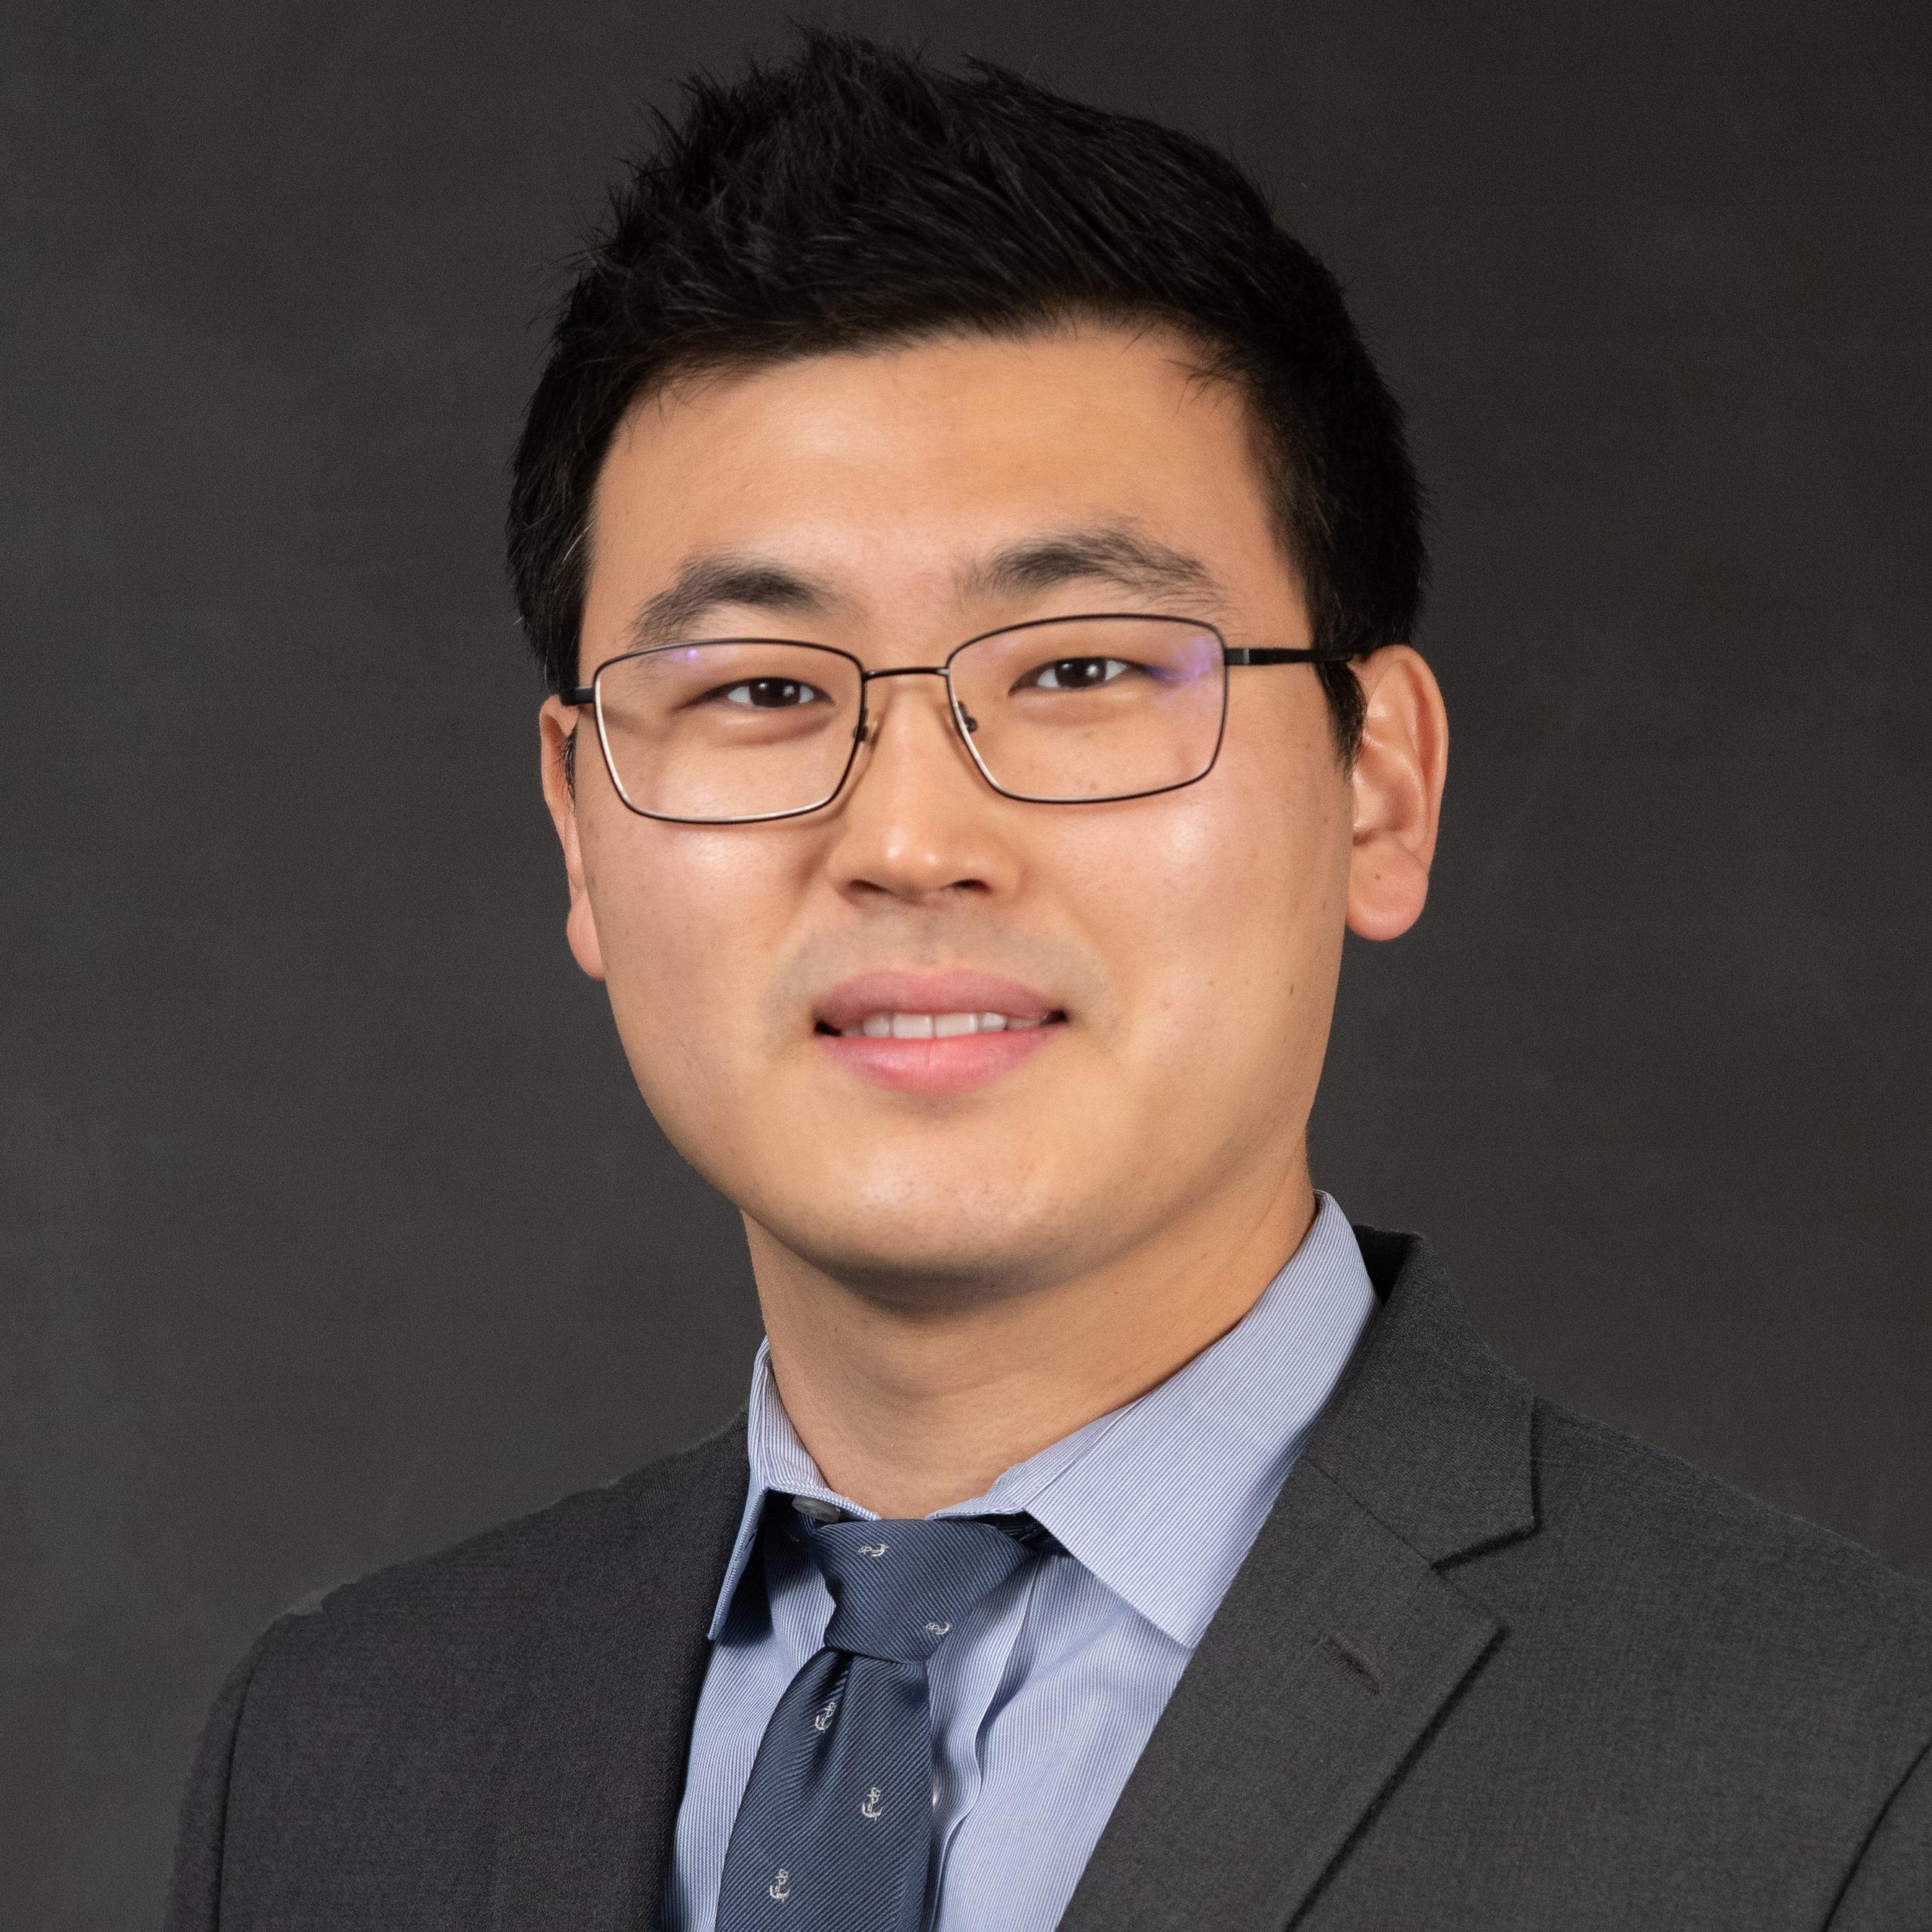 Dr. David Kim - Gastroenterologist near me